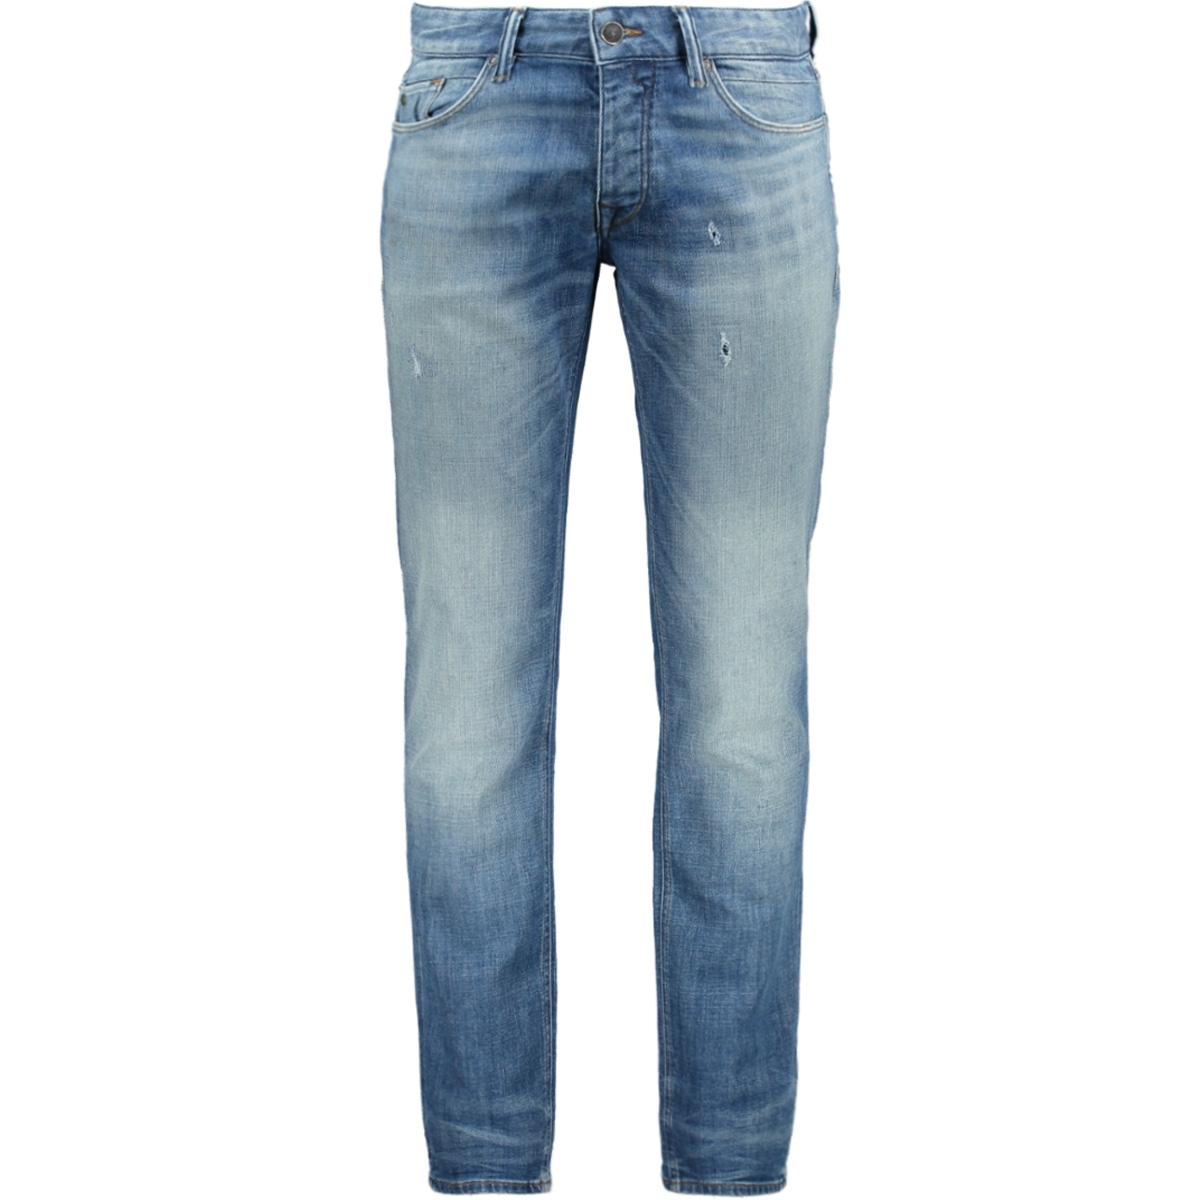 ctr188205 cast iron jeans wwv